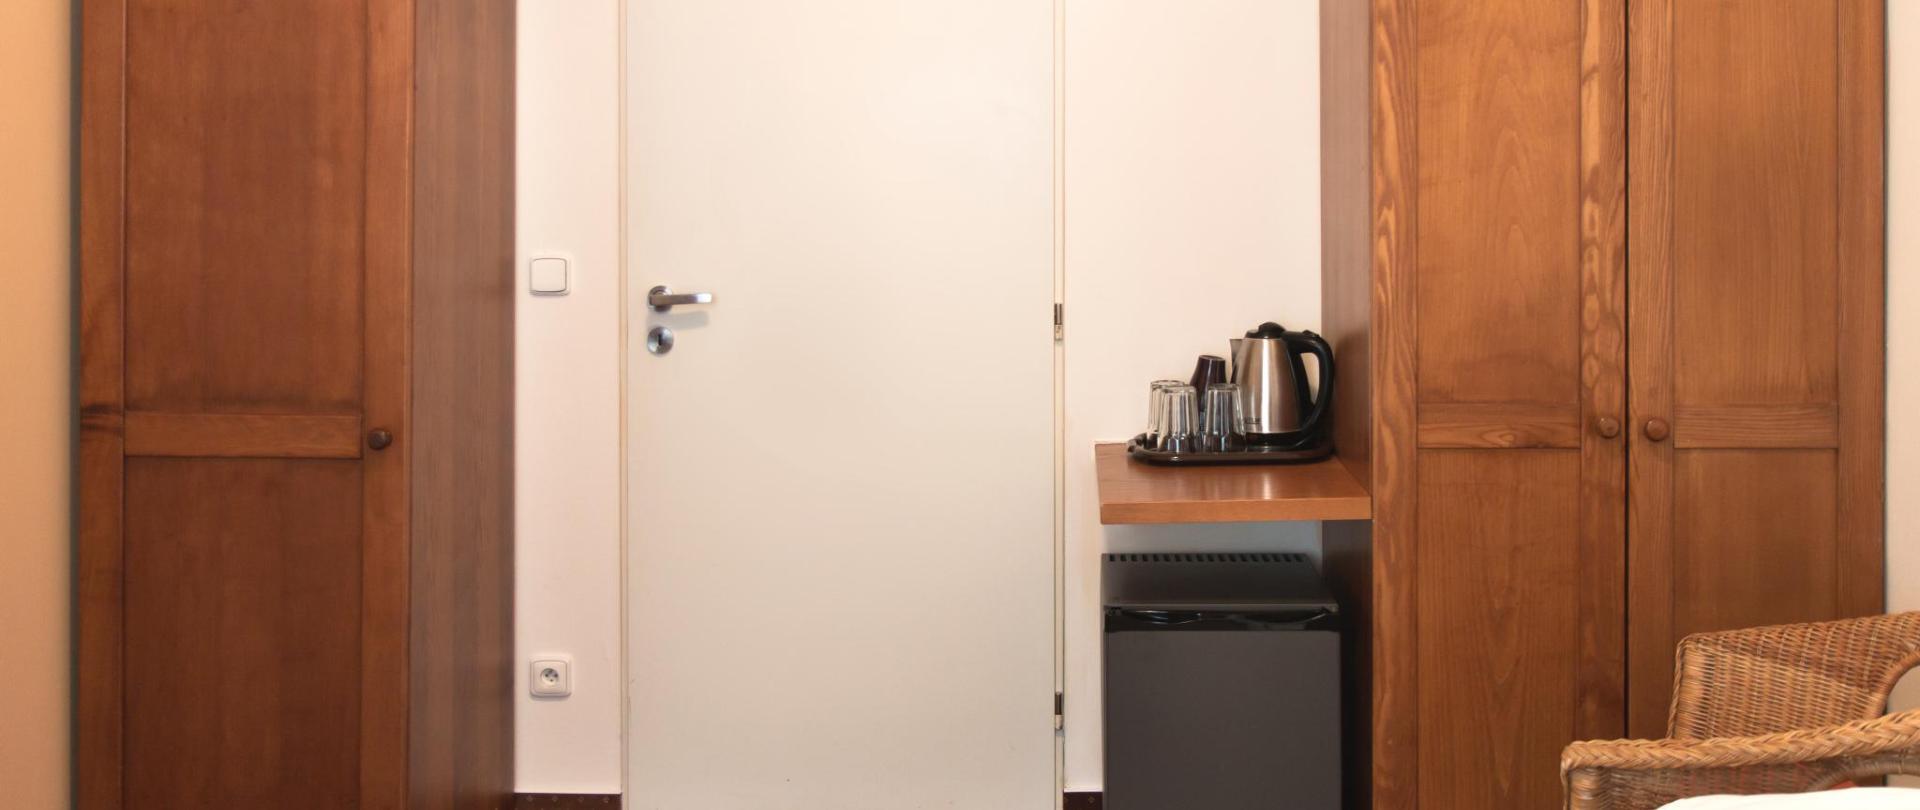 apartman pokoj nalevo dveře 0364.jpg